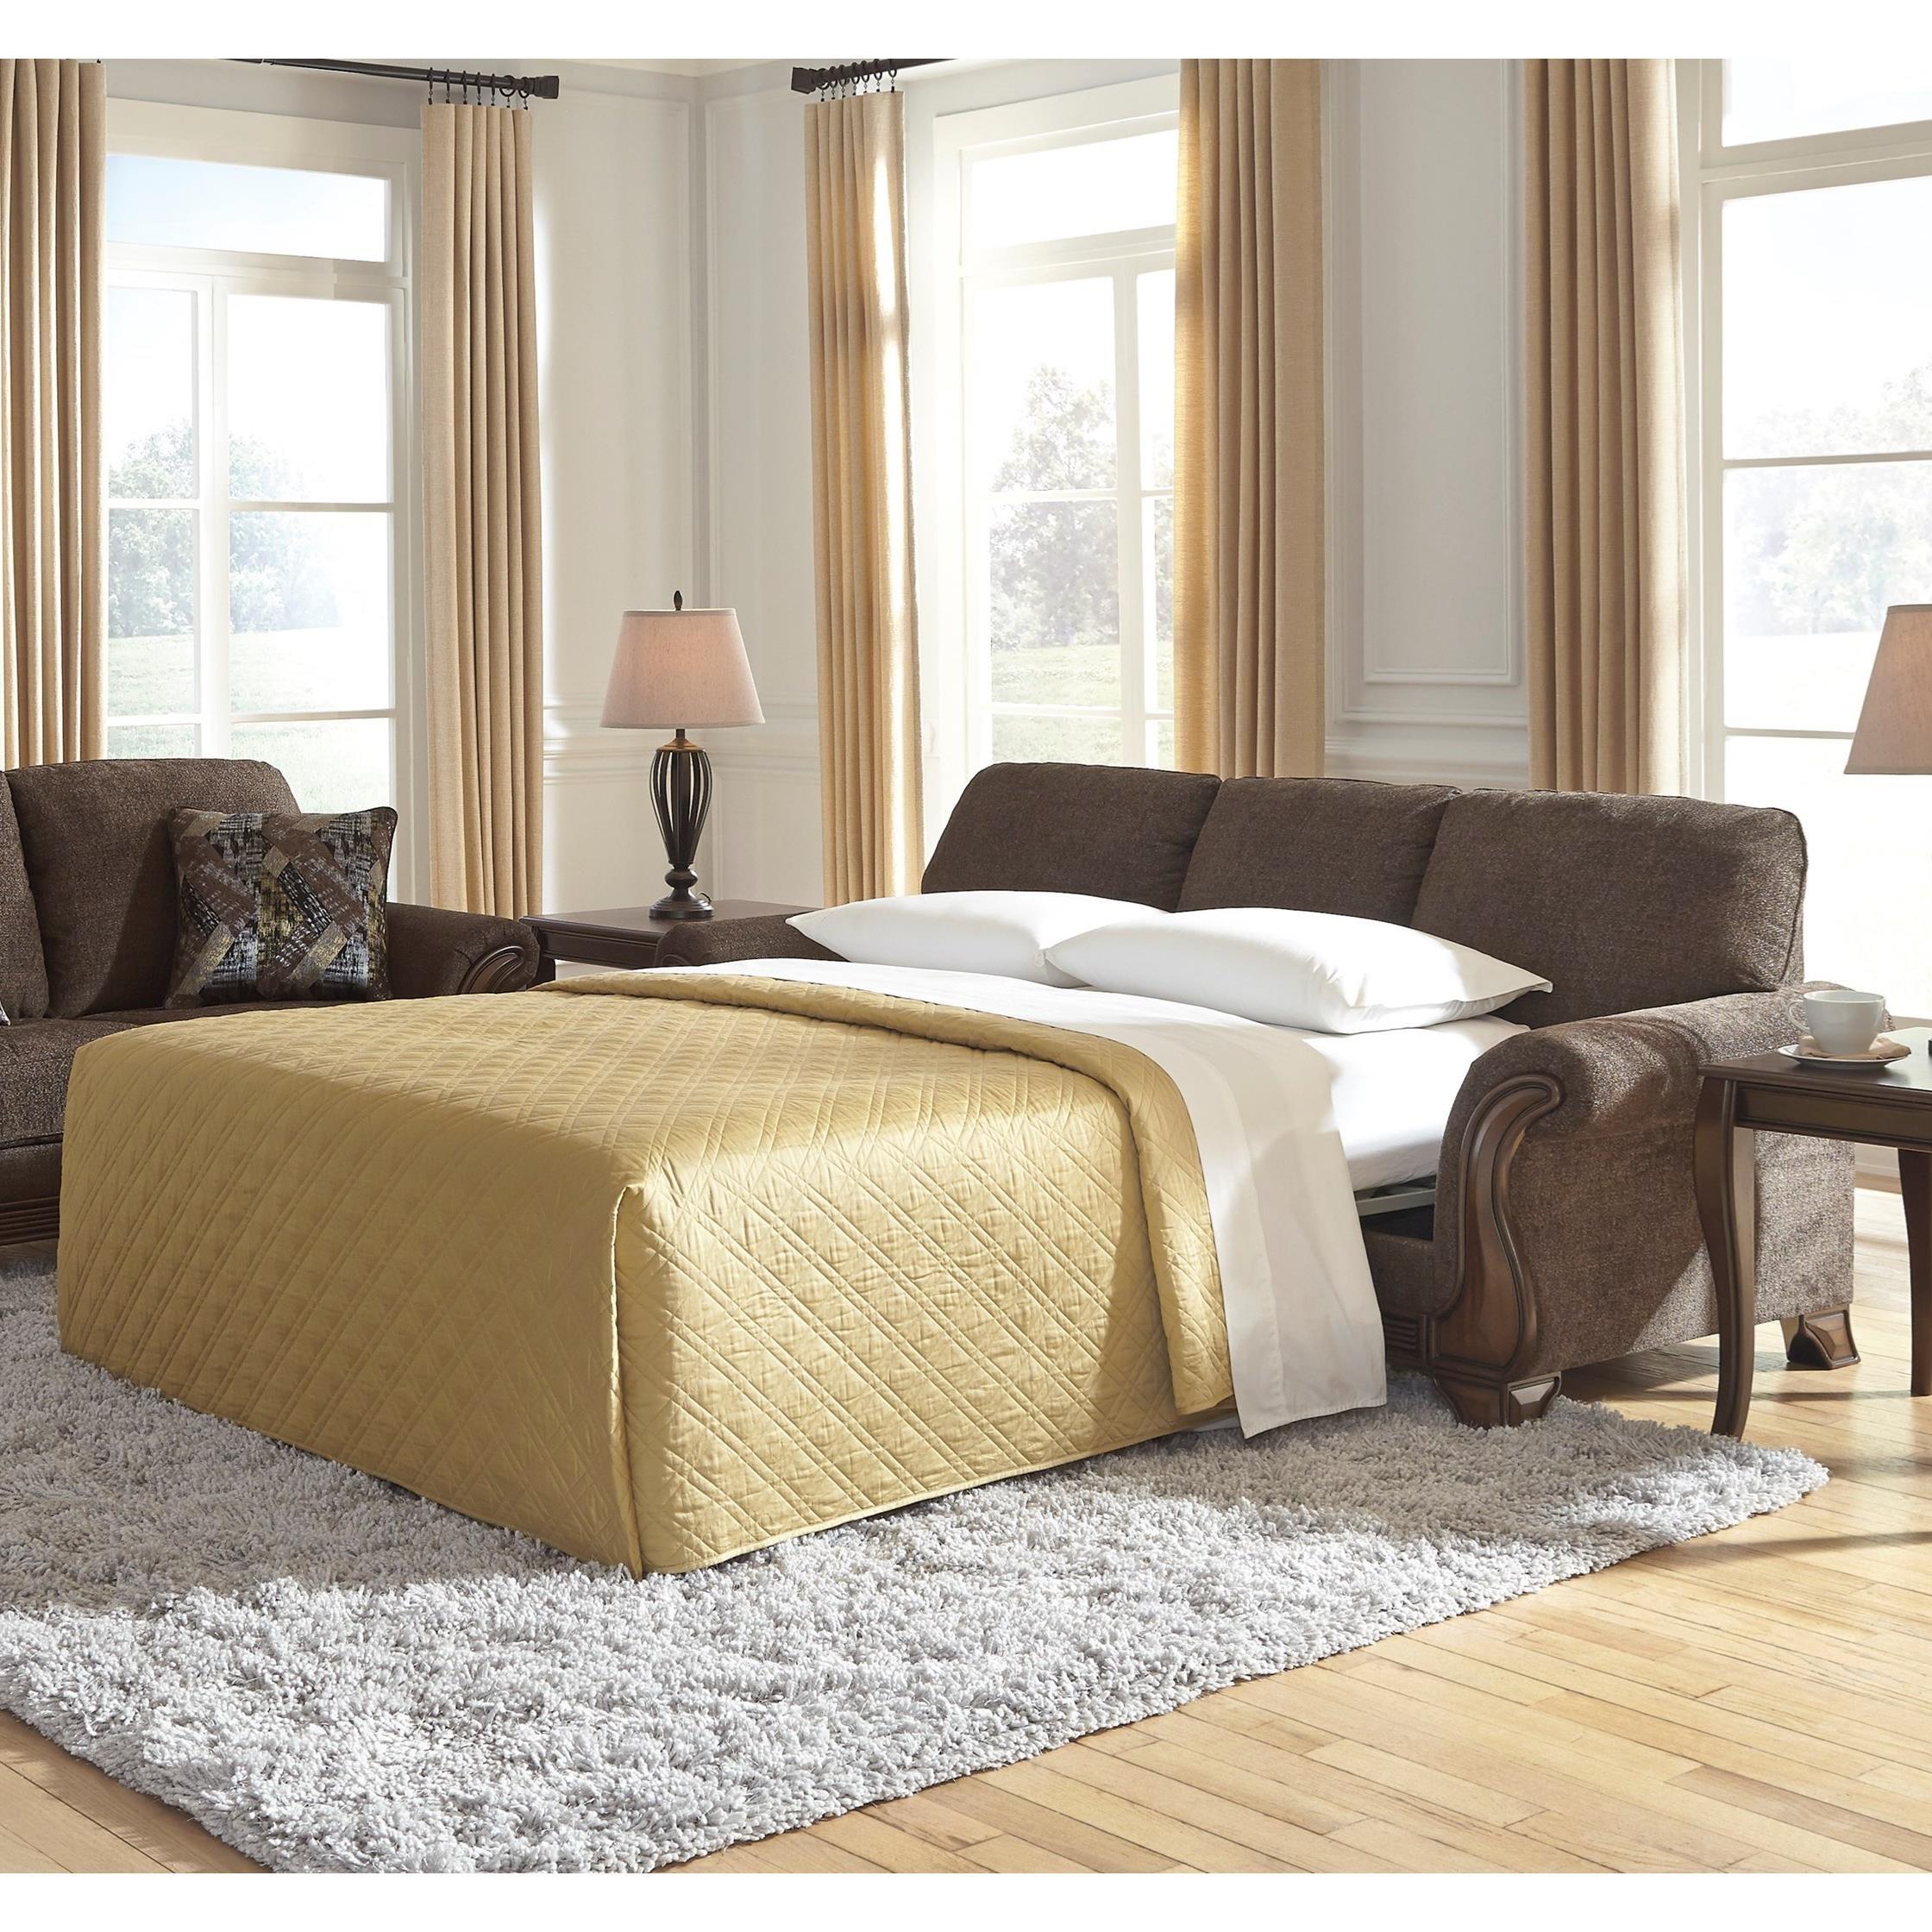 Miltonwood Queen Sofa Sleeper by Benchcraft at Walker's Furniture